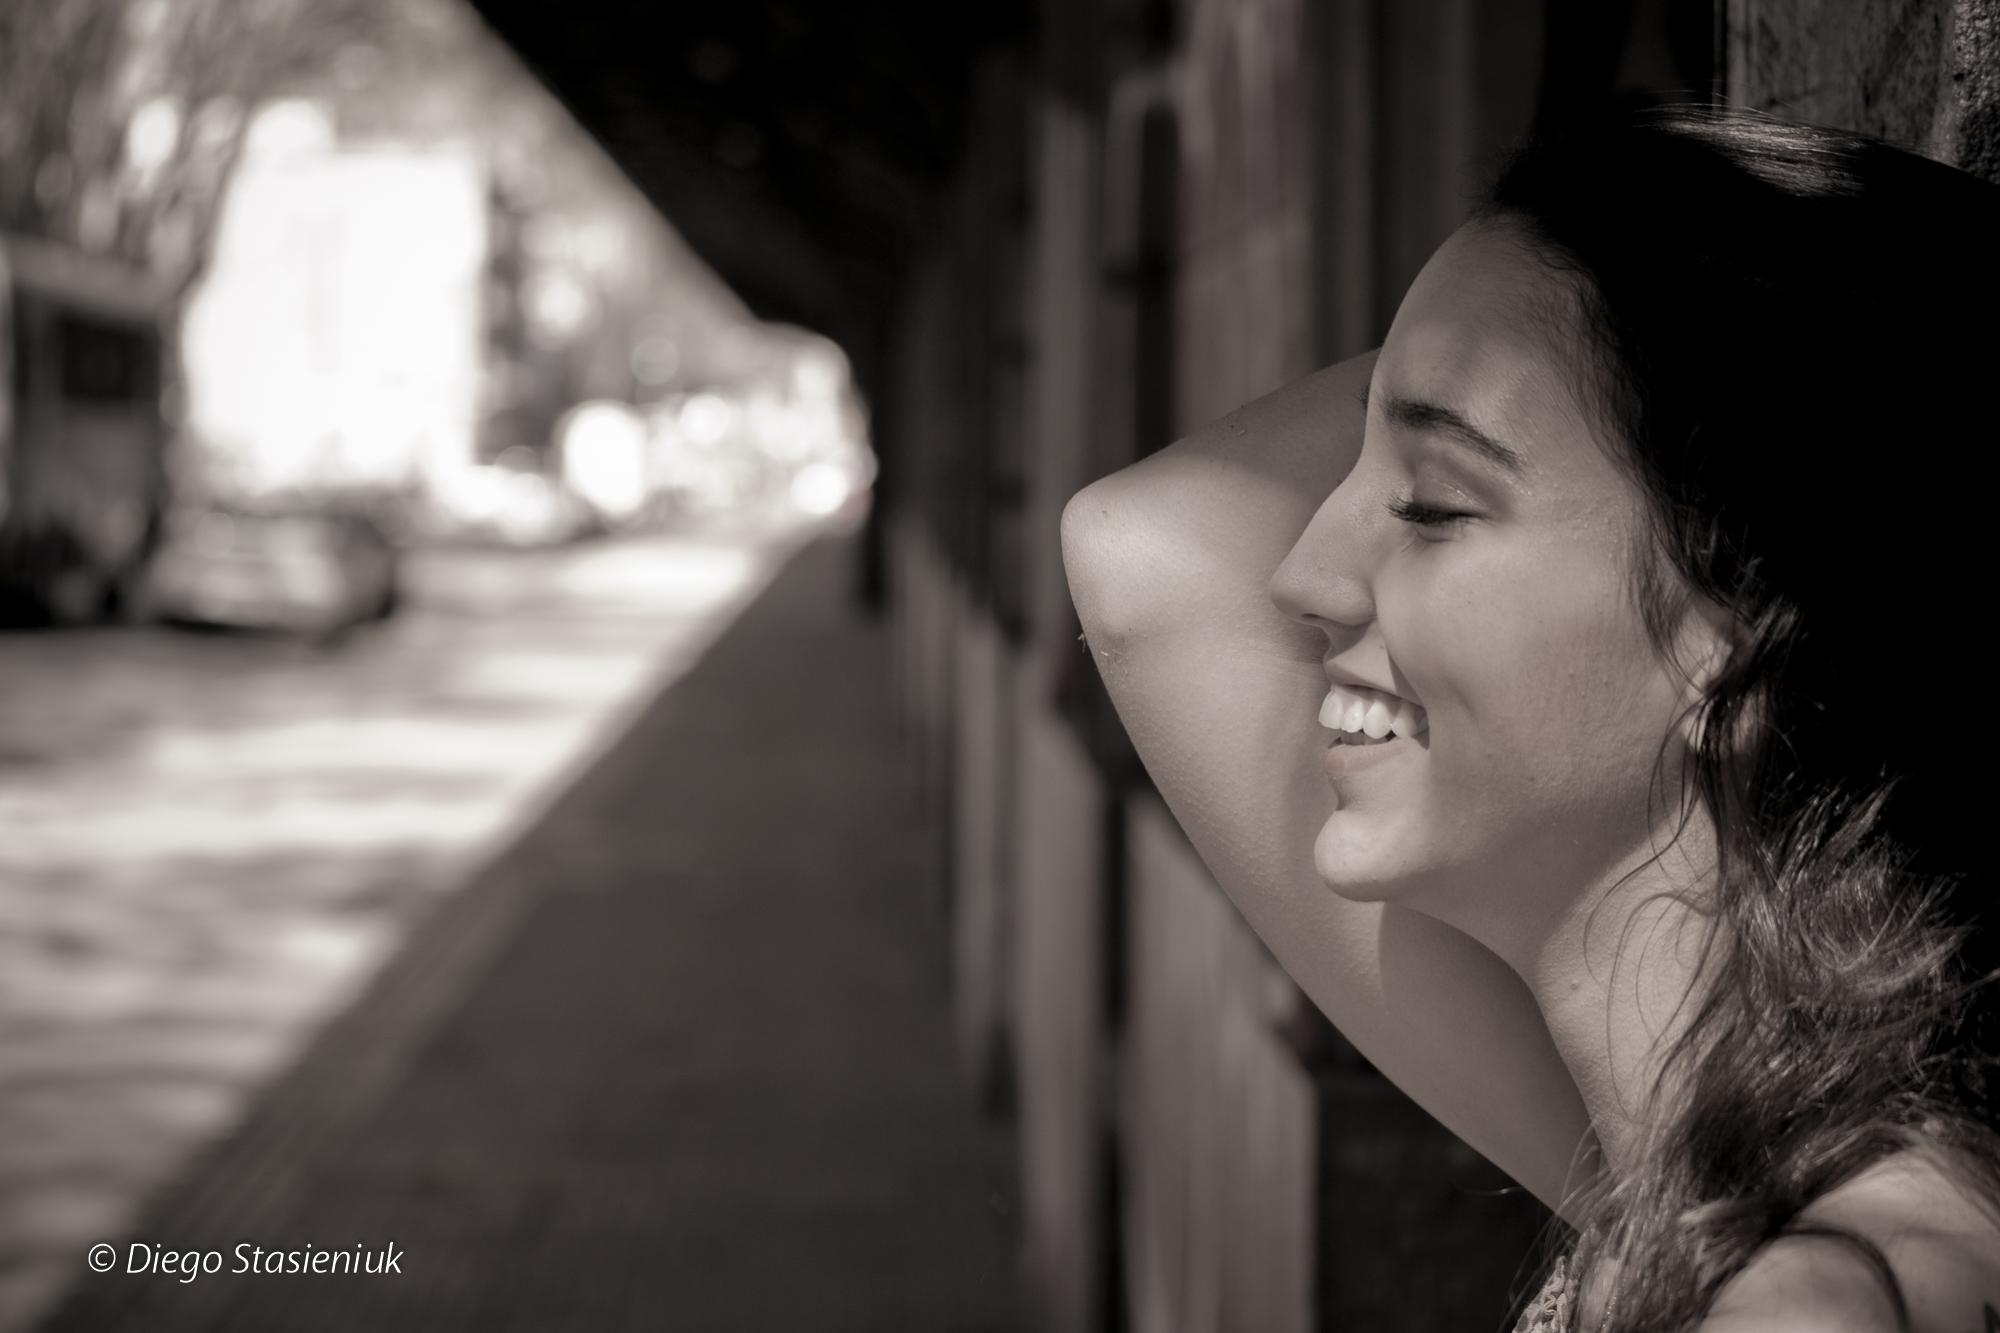 fotografia en uruguay